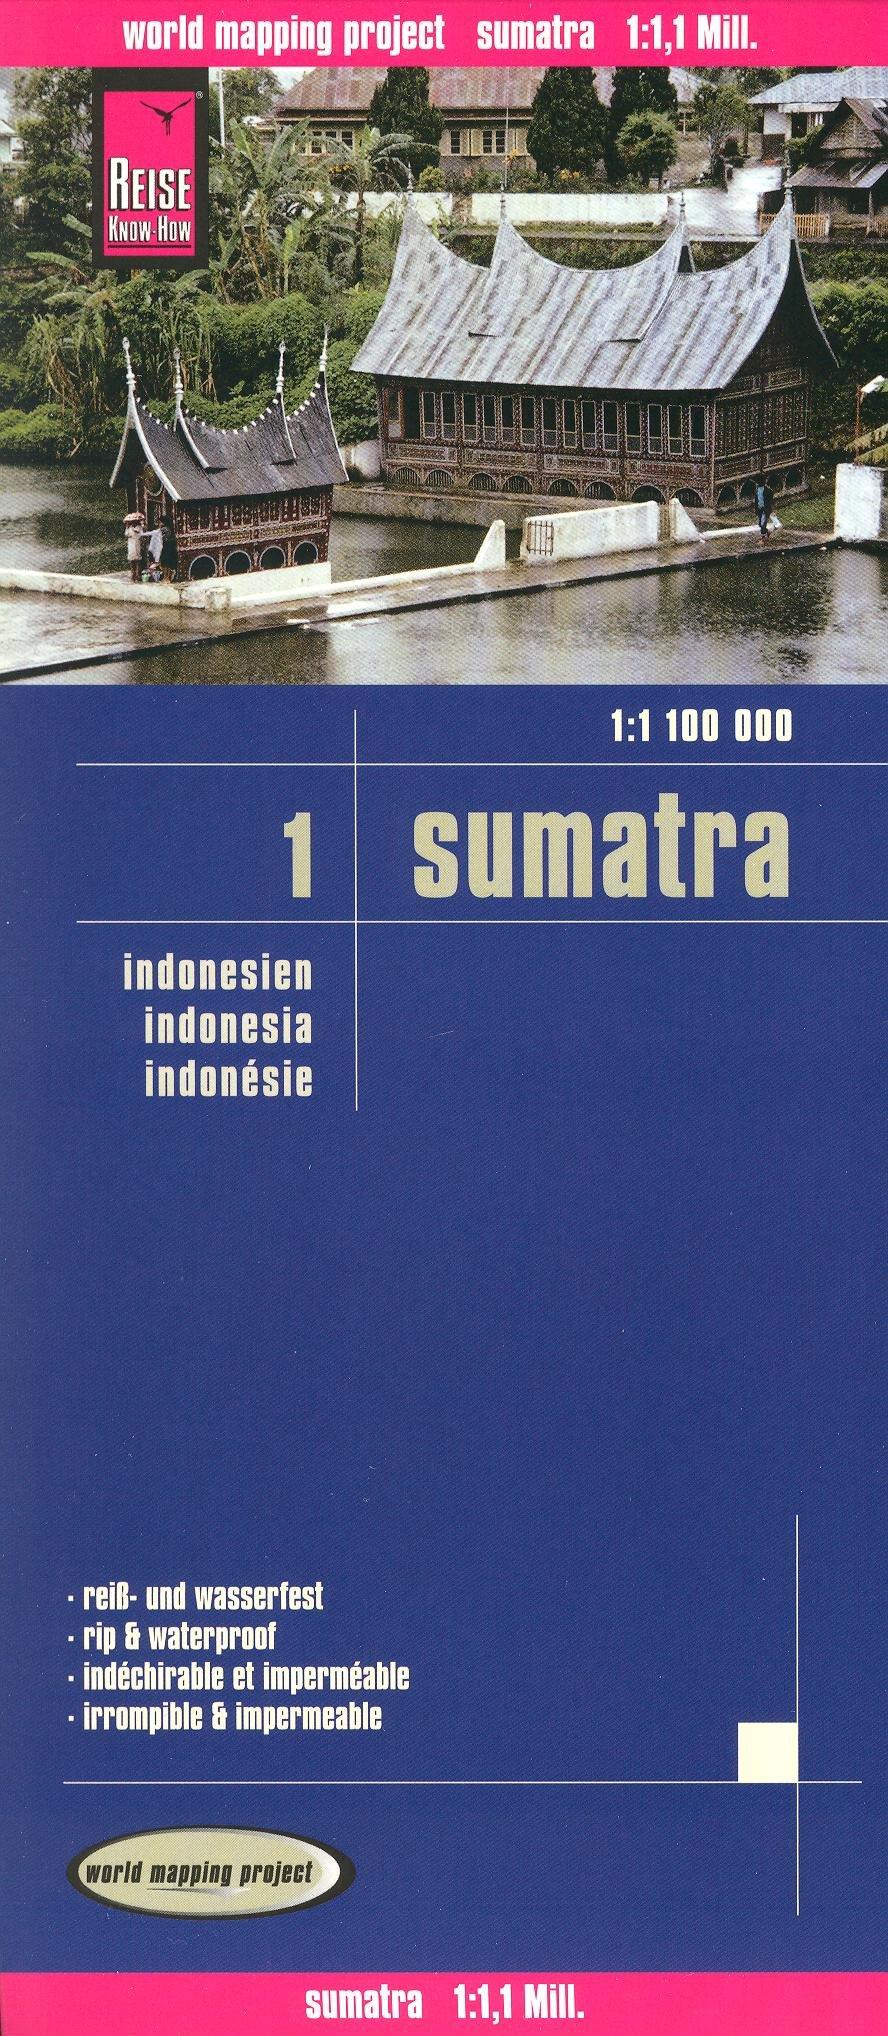 Sumatra 1:1,100,000 Travel Map, waterproof, GPS-compatible REISE